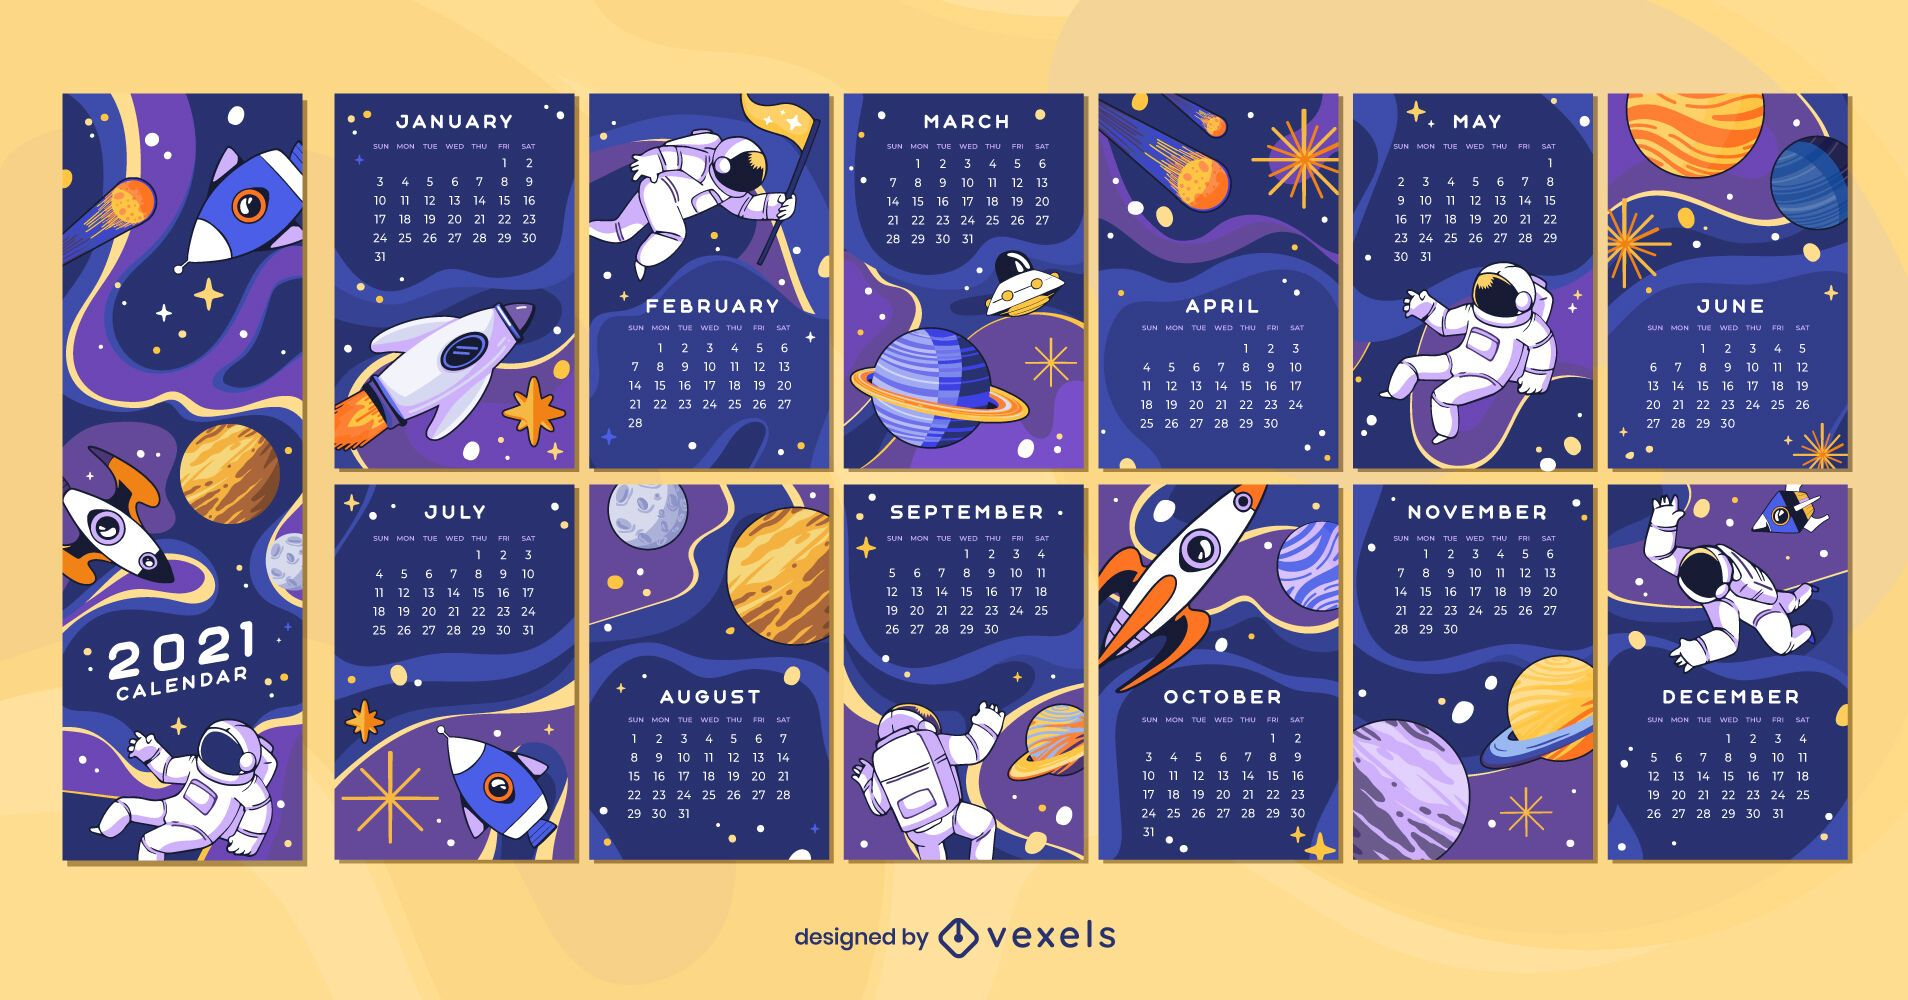 Space 2021 Calendar Design - Vector Download